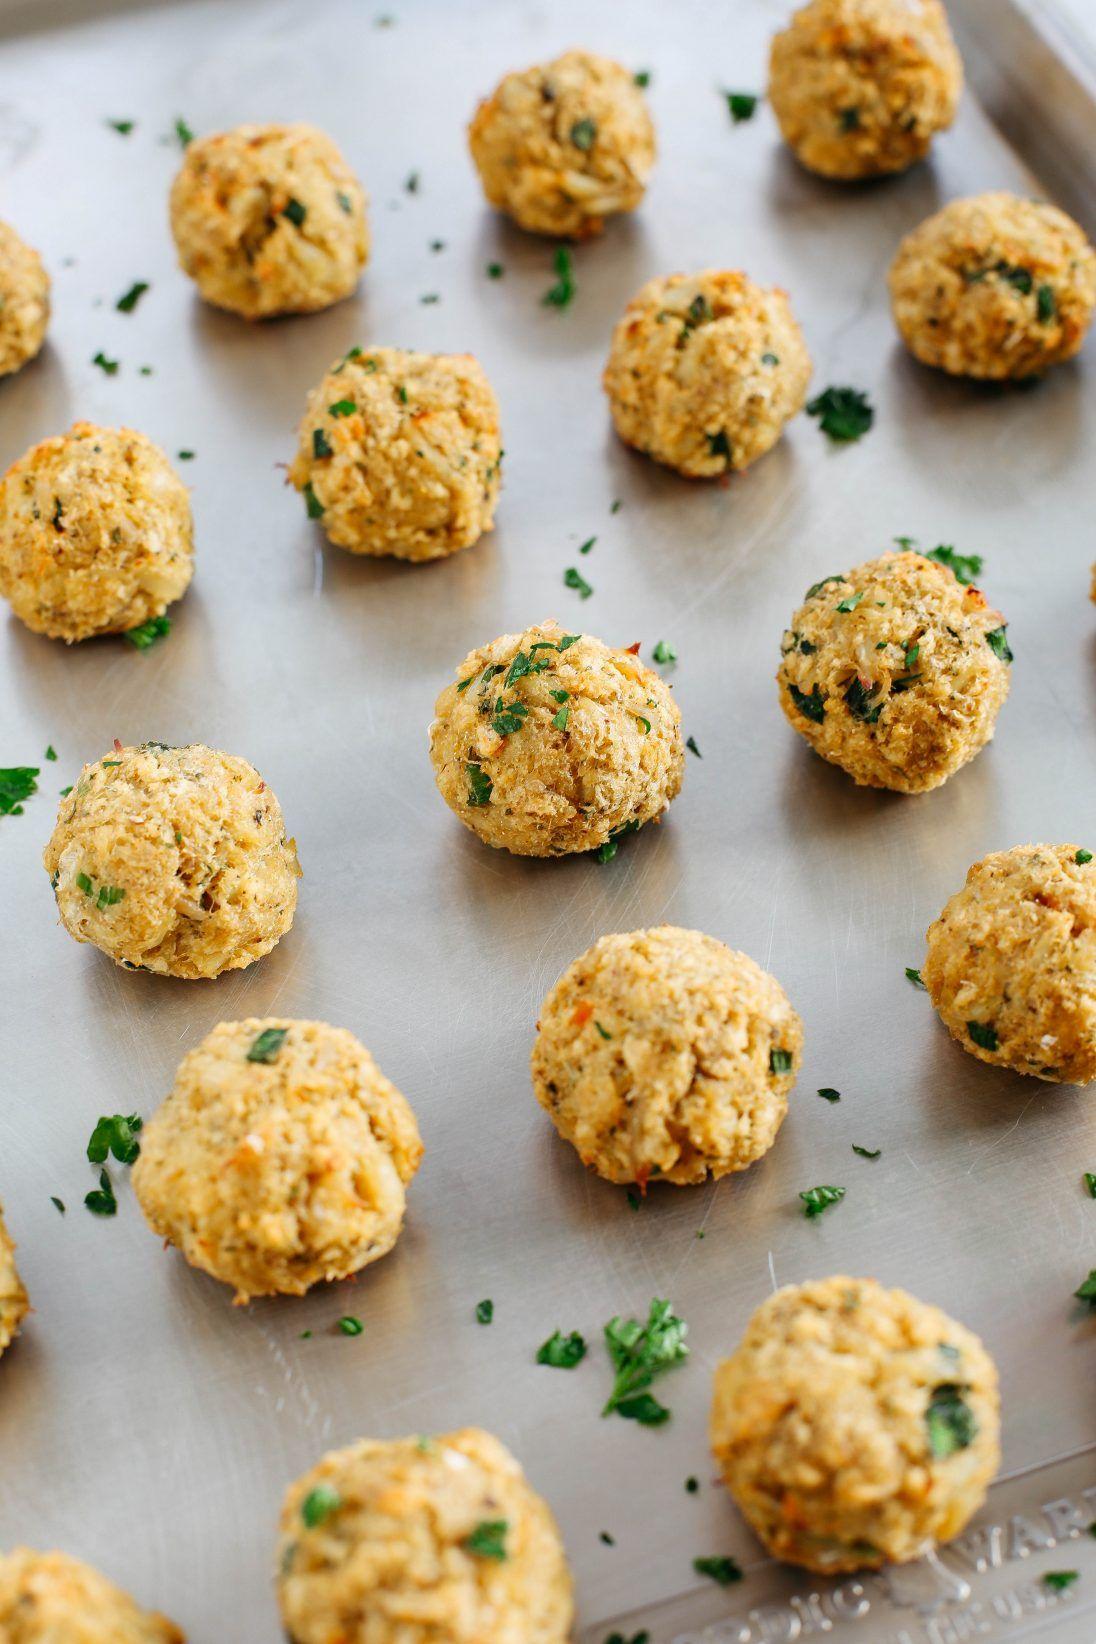 Baked crab cake balls with sriracha dipping sauce recipe